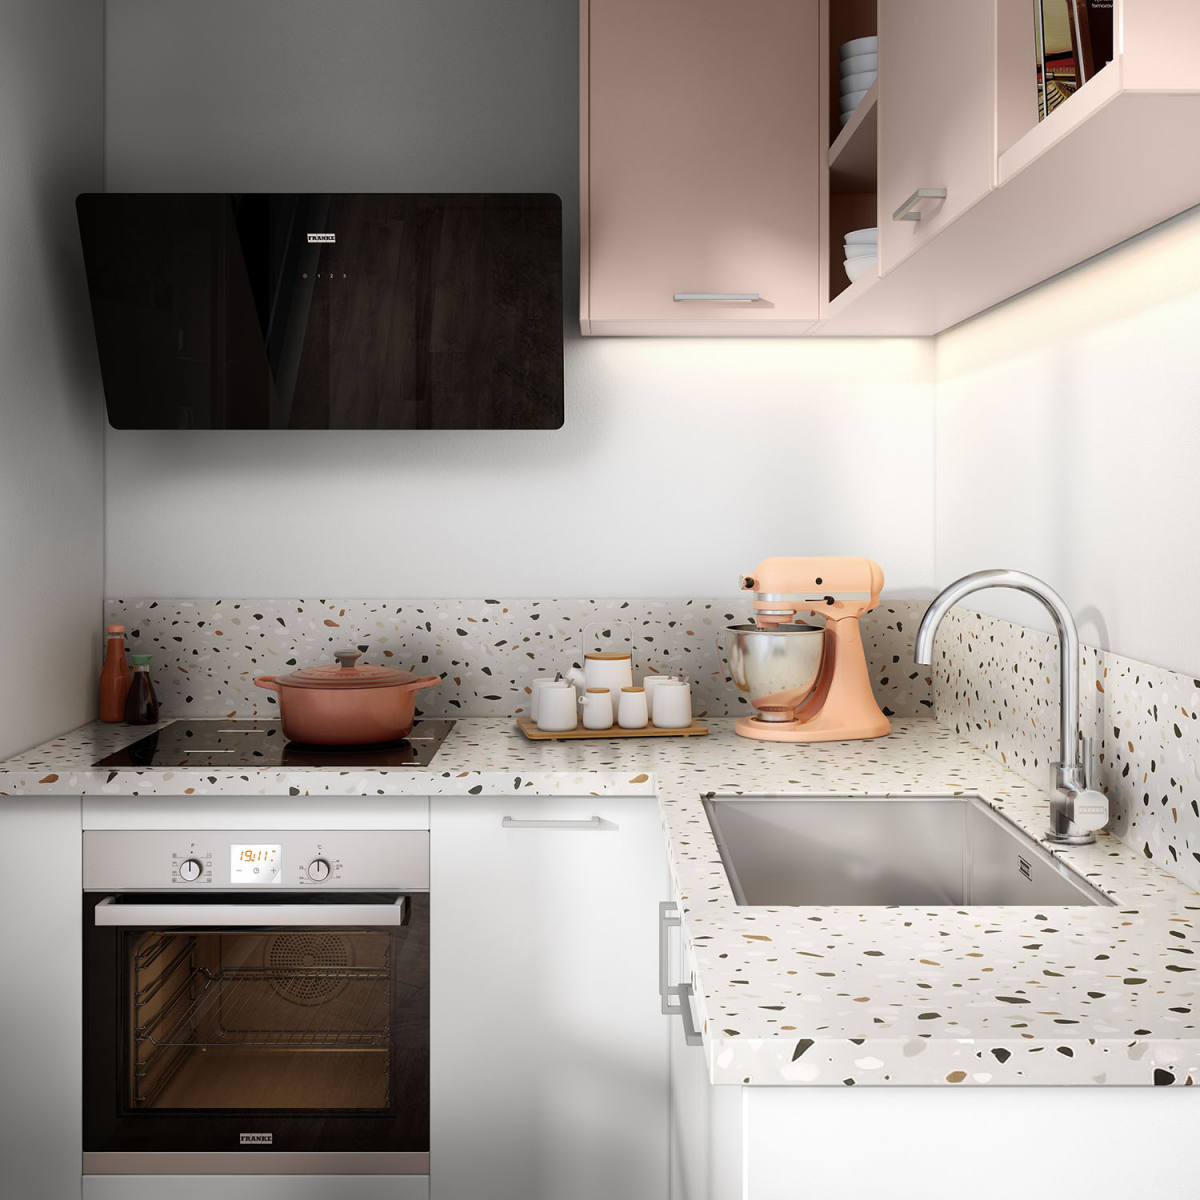 10 Best Kitchen Sinks In Singapore Best Of Home 2021